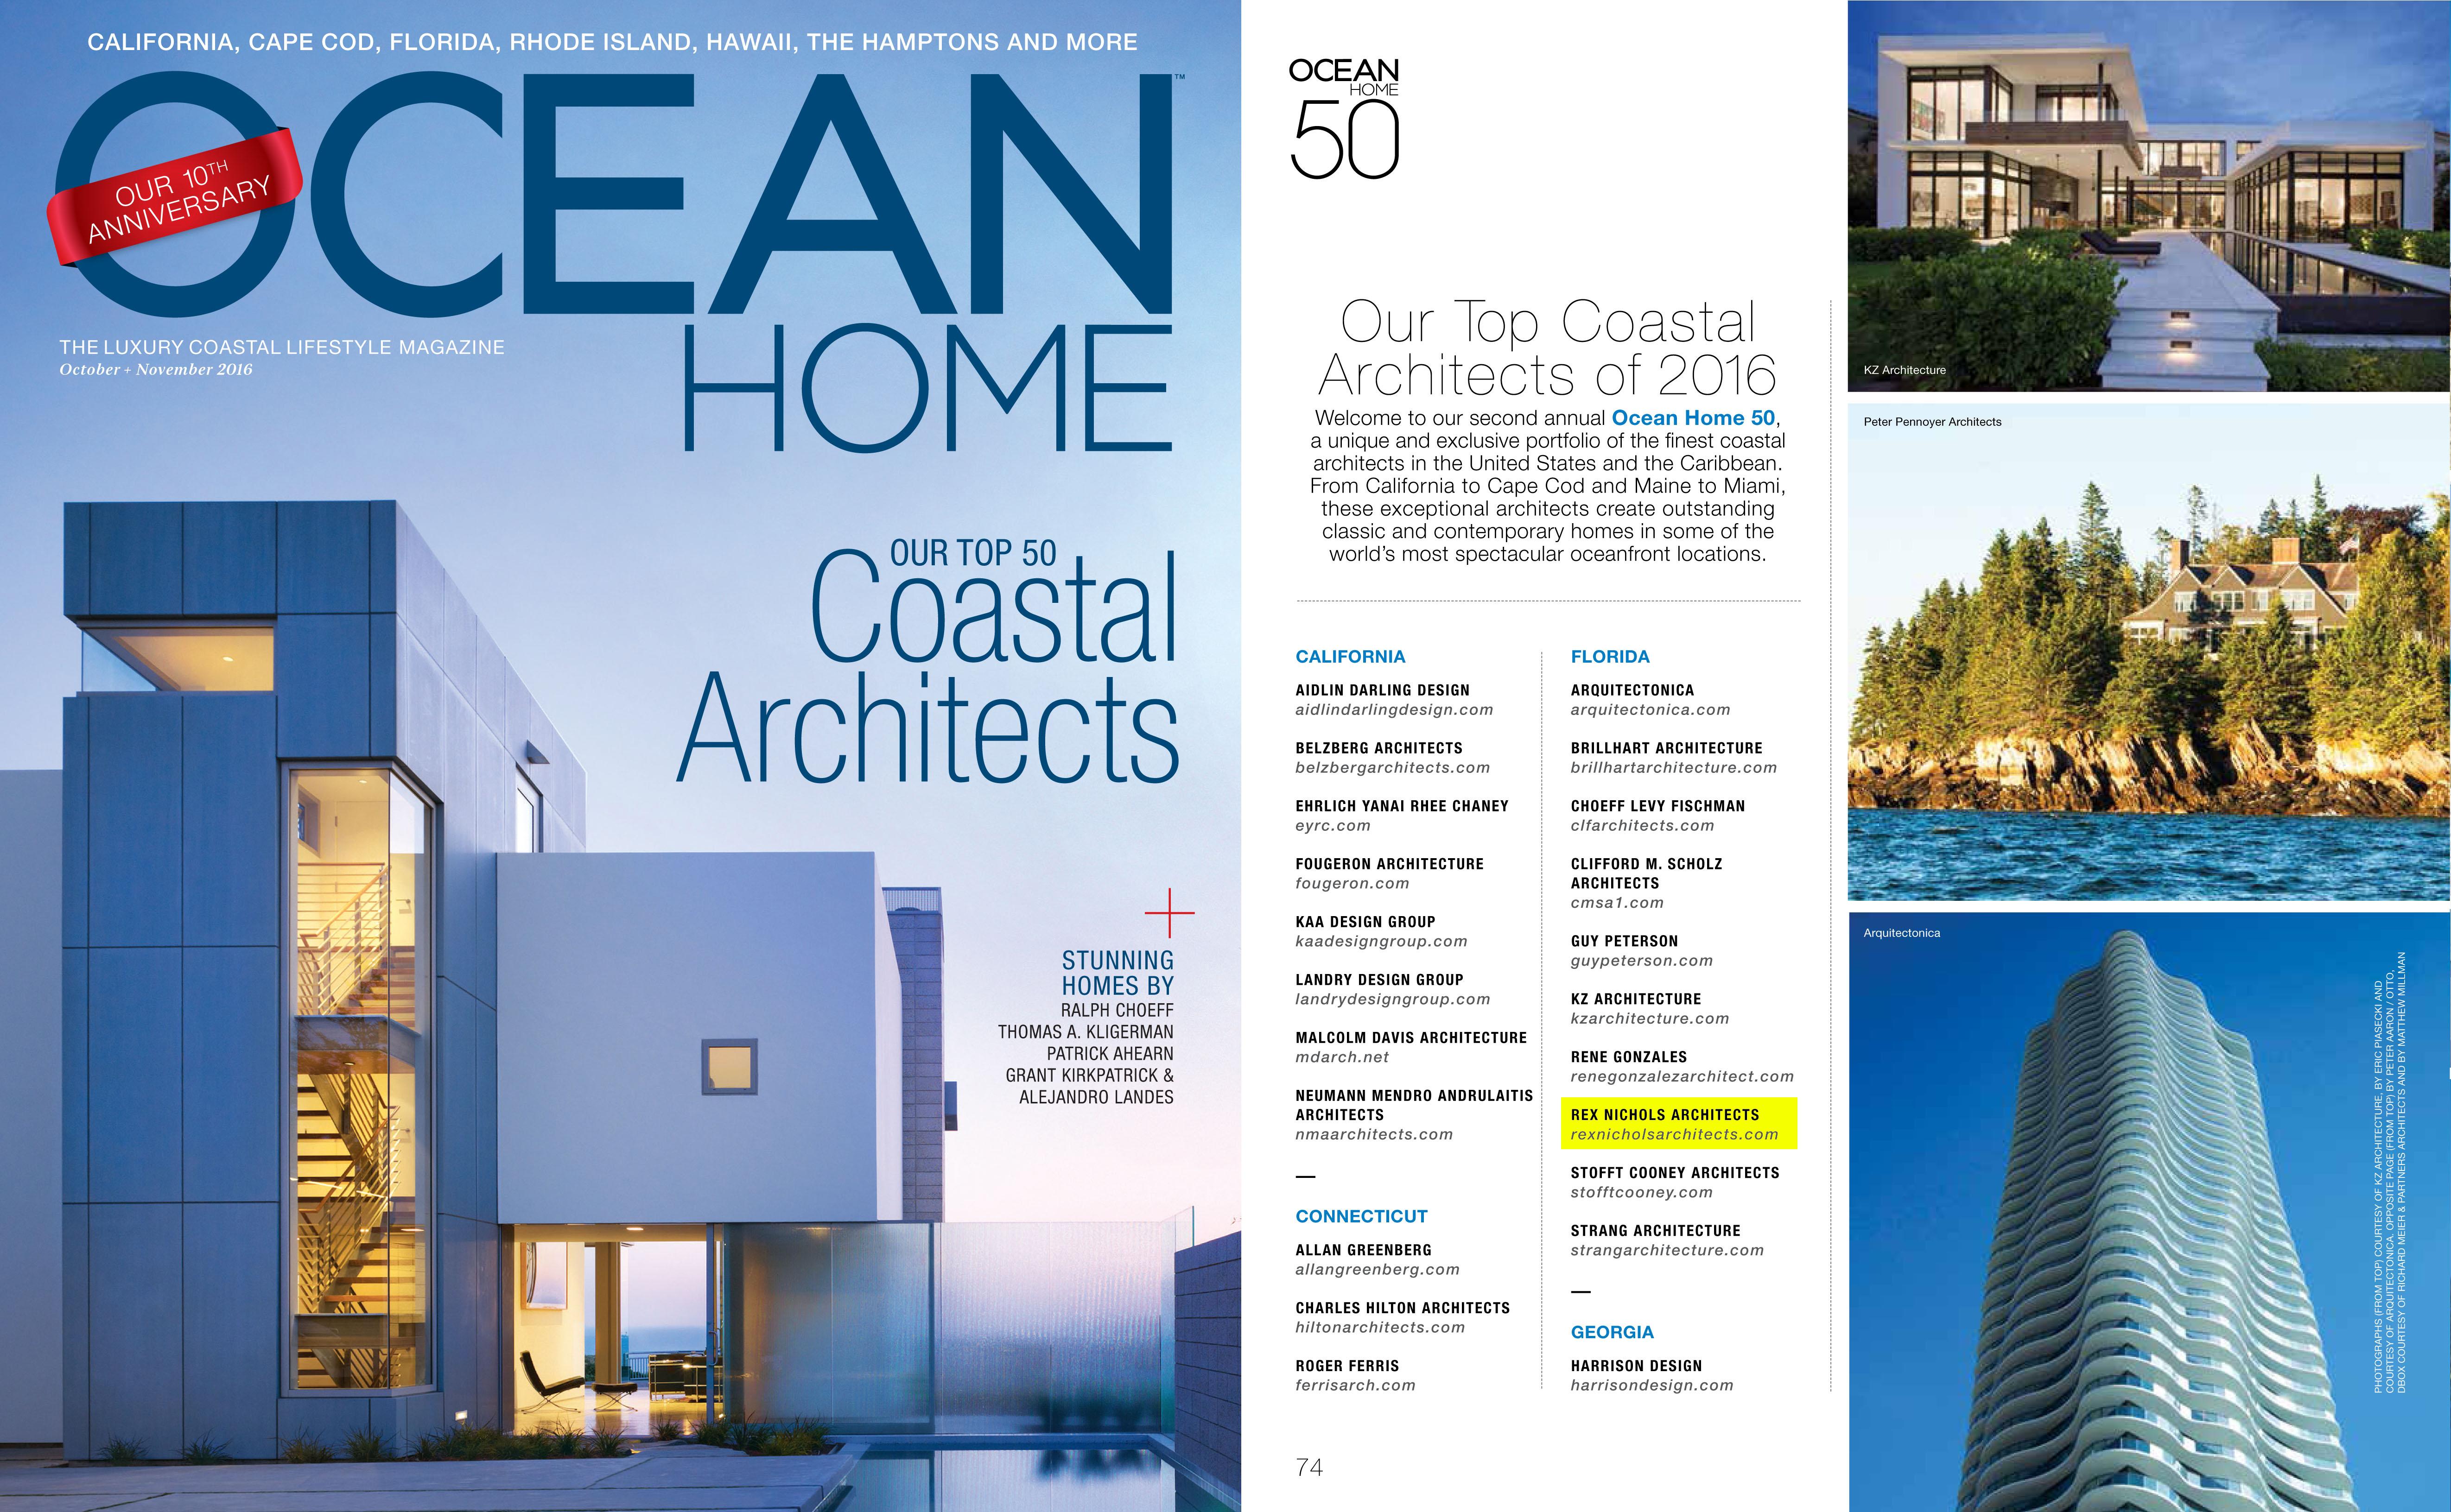 Top 50 Coastal Architects of 2016